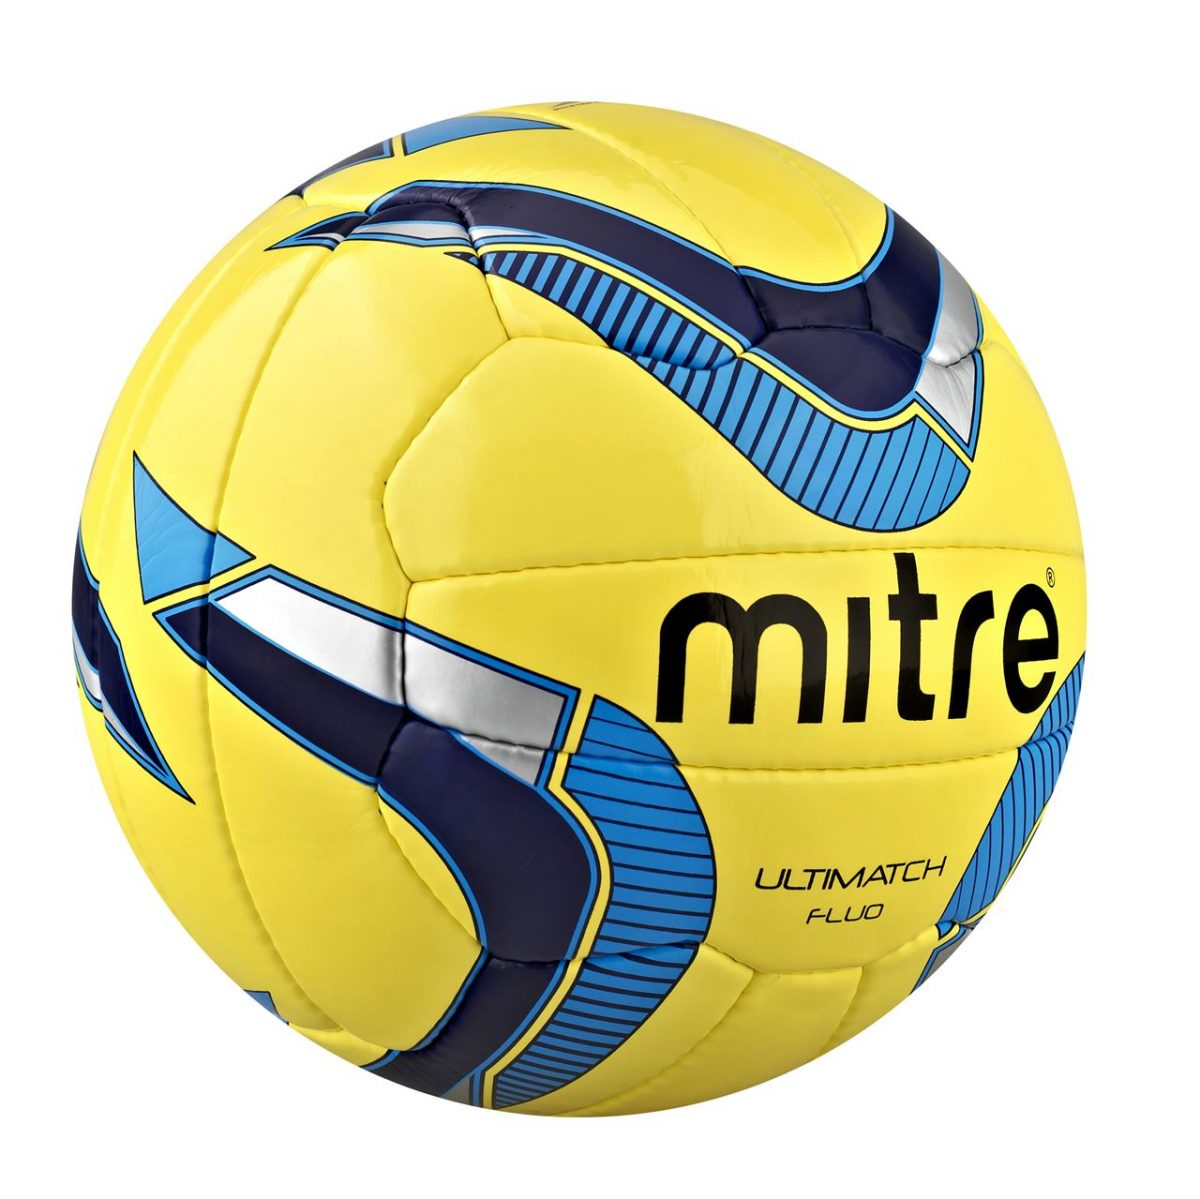 Mitre Ultimatch Fluo Match Football